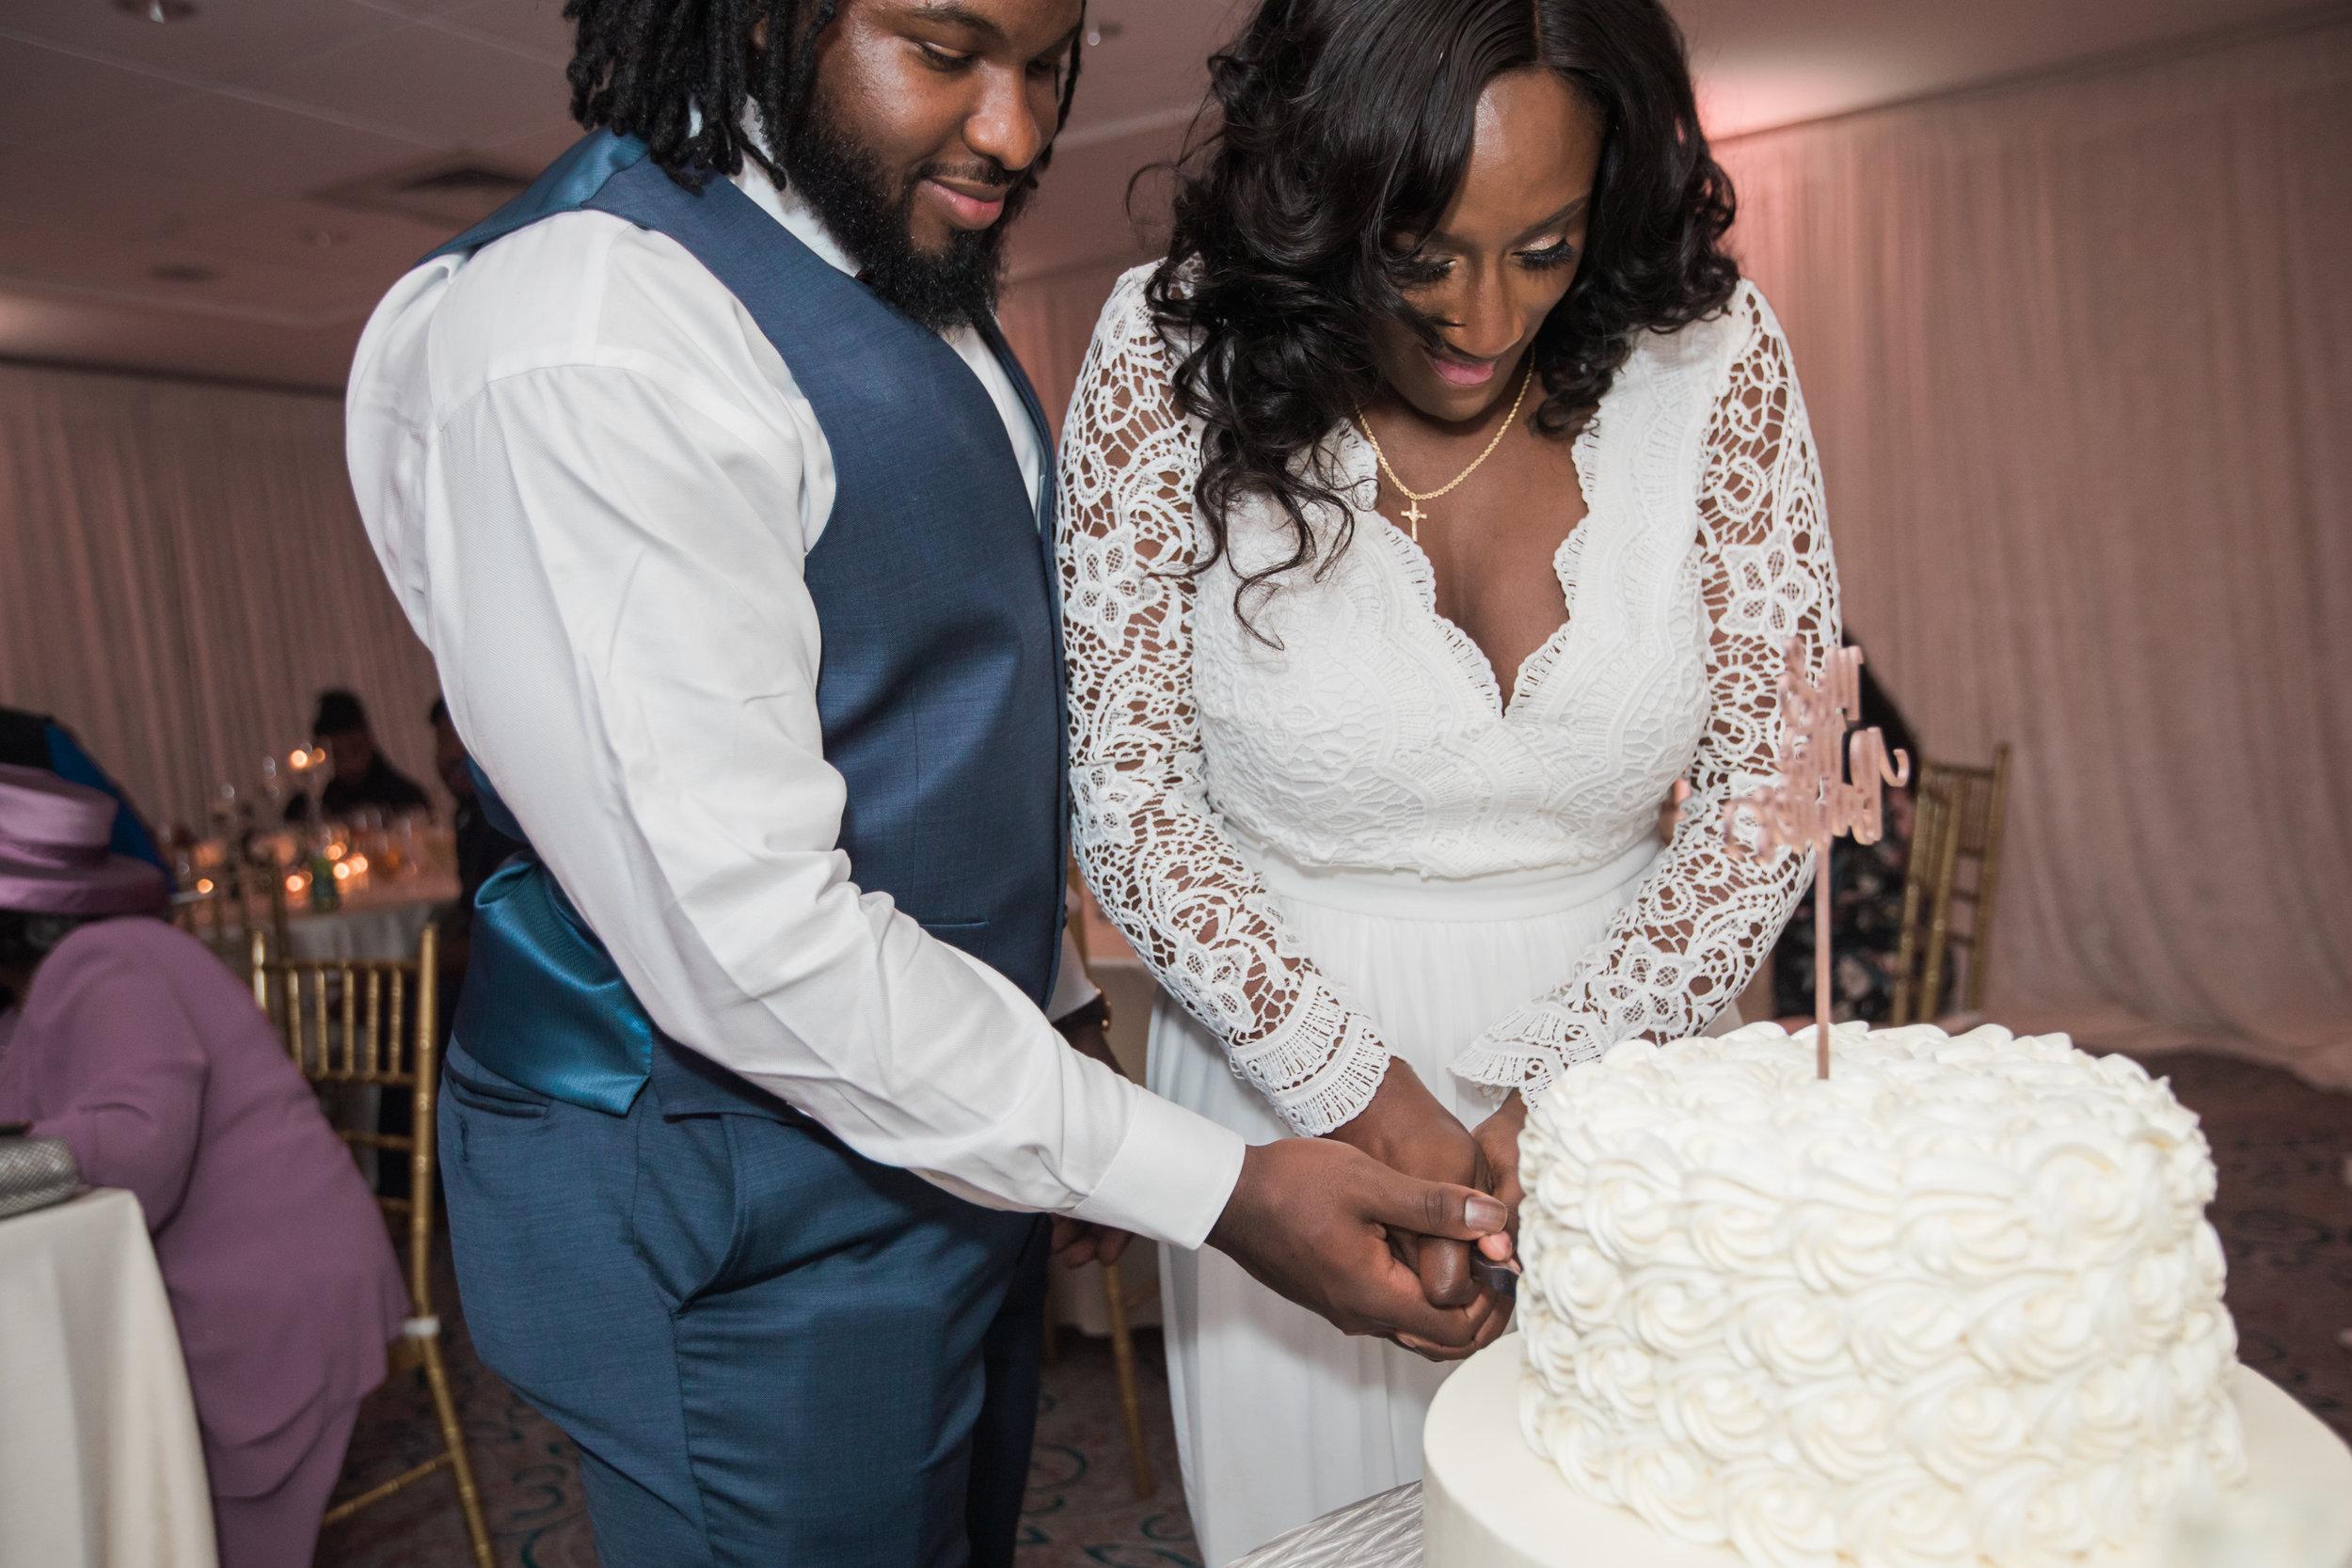 Baltimore City Wedding at Hotel Indigo Megapixels Media Photography Tira Lynn Events Black Bride and Groom (67 of 74).jpg